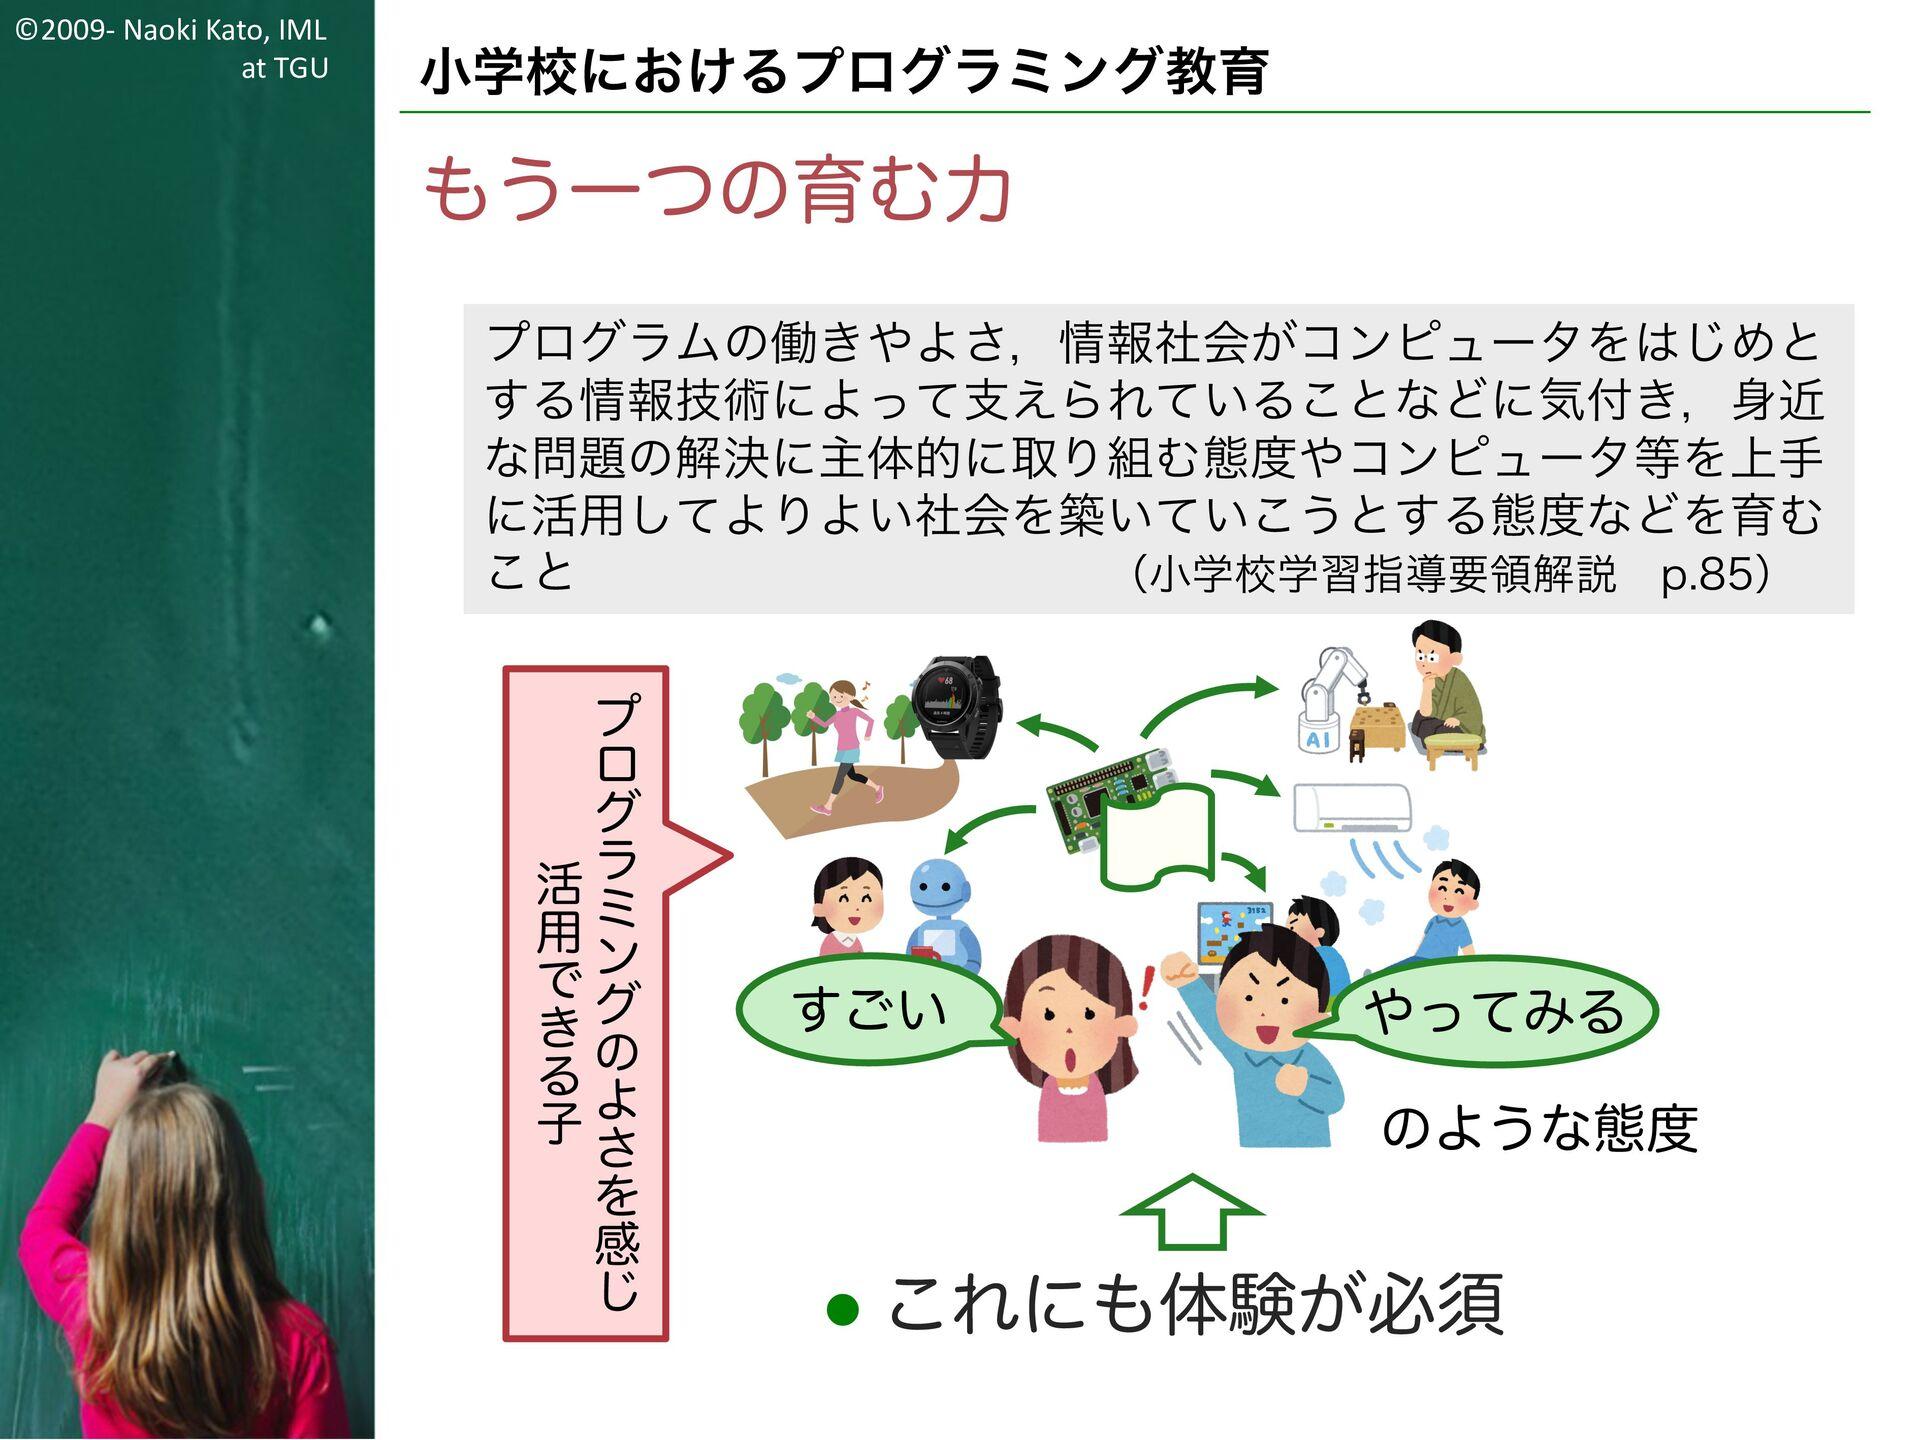 ©2009- Naoki Kato, IML at TGU プログラミング教育の展開 学習指導...